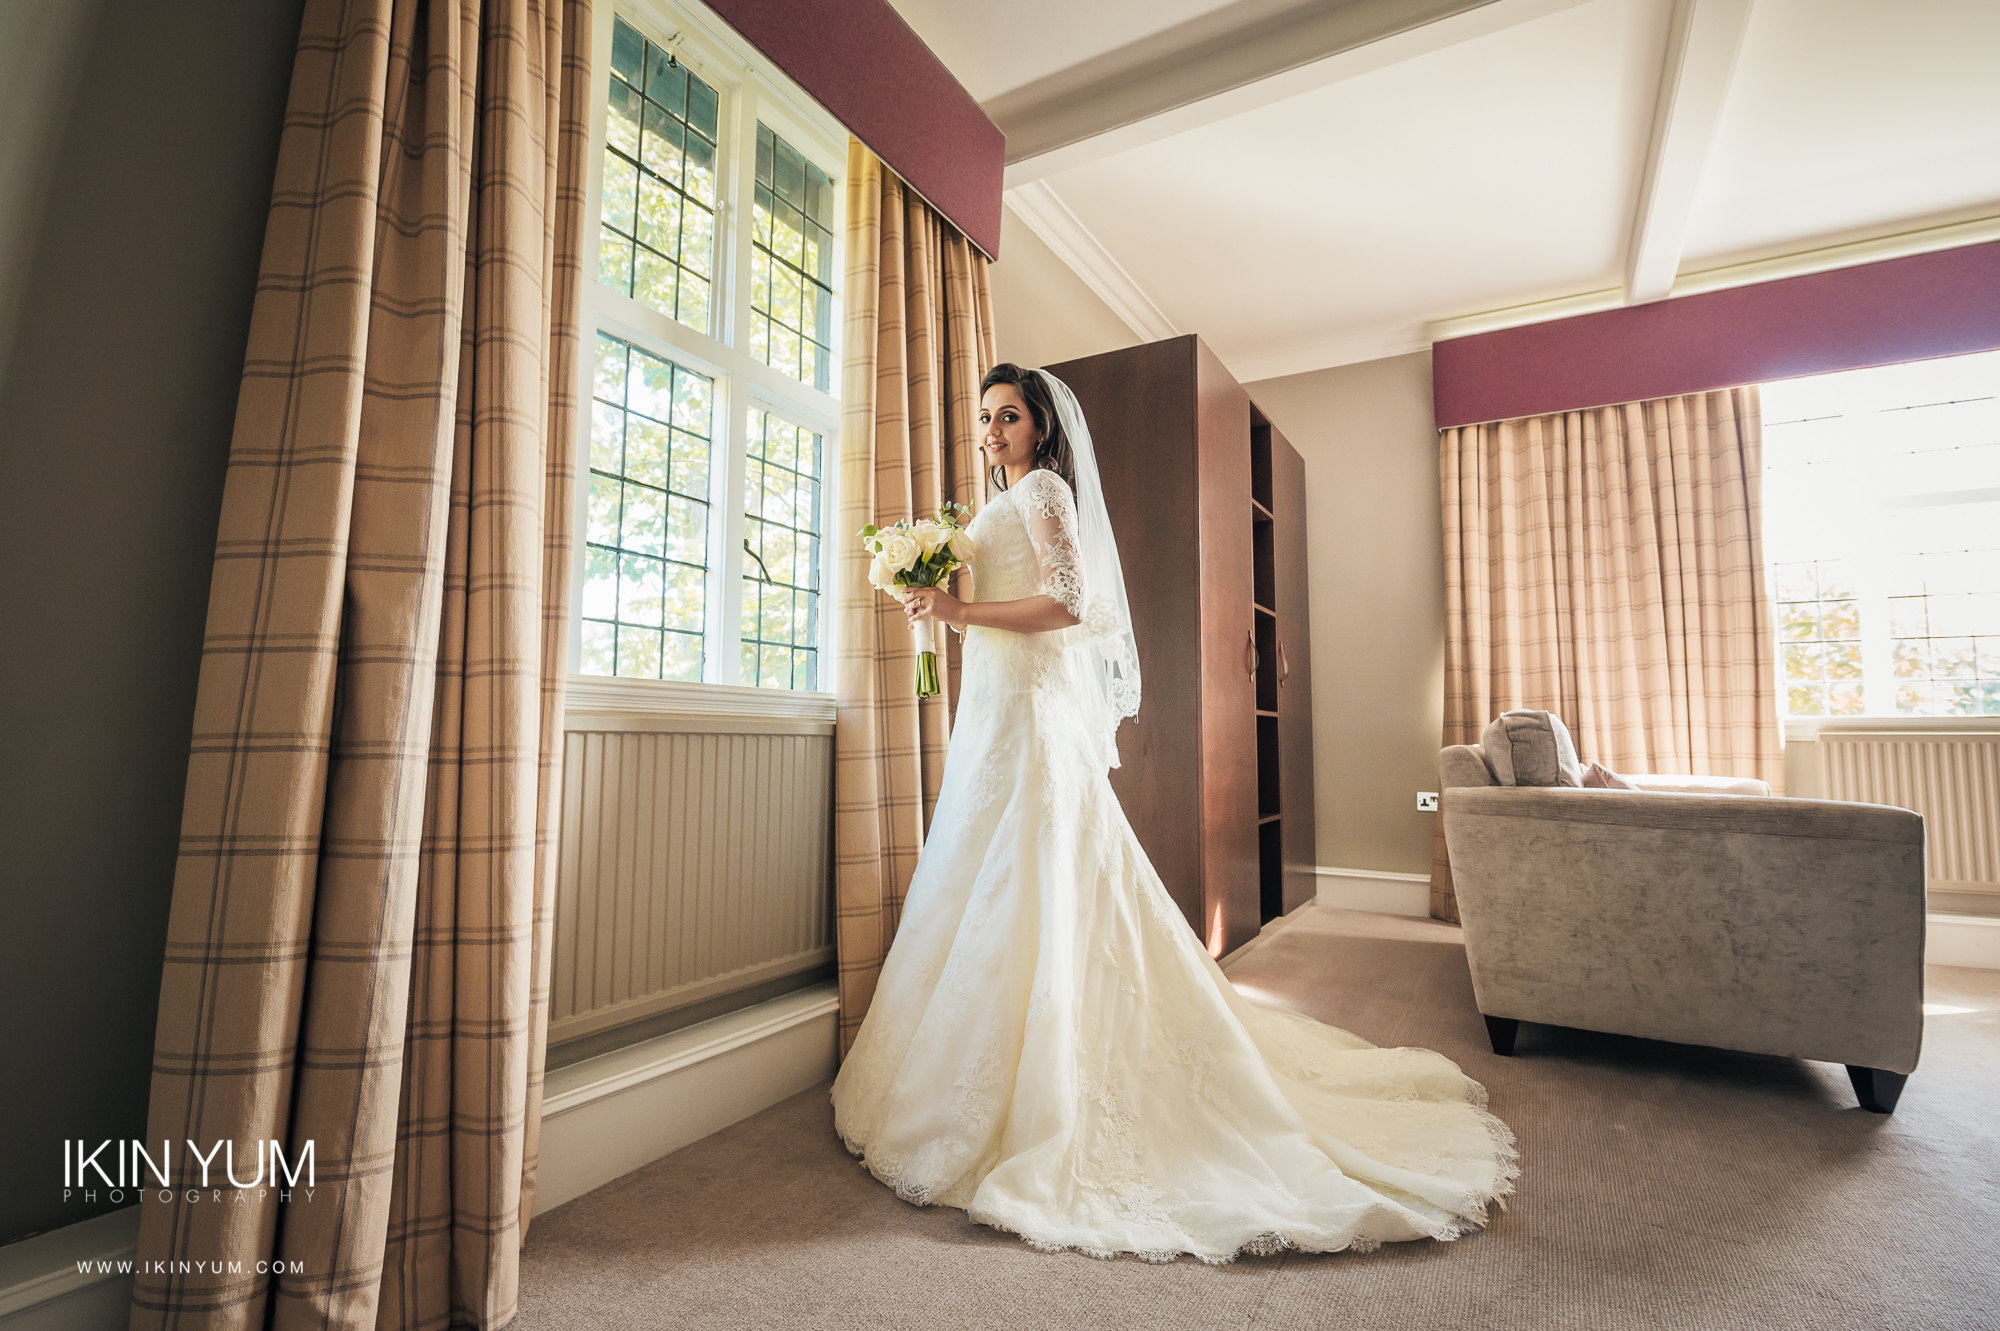 Laura Ashley Manor Wedding - Ikin Yum Photography-027.jpg